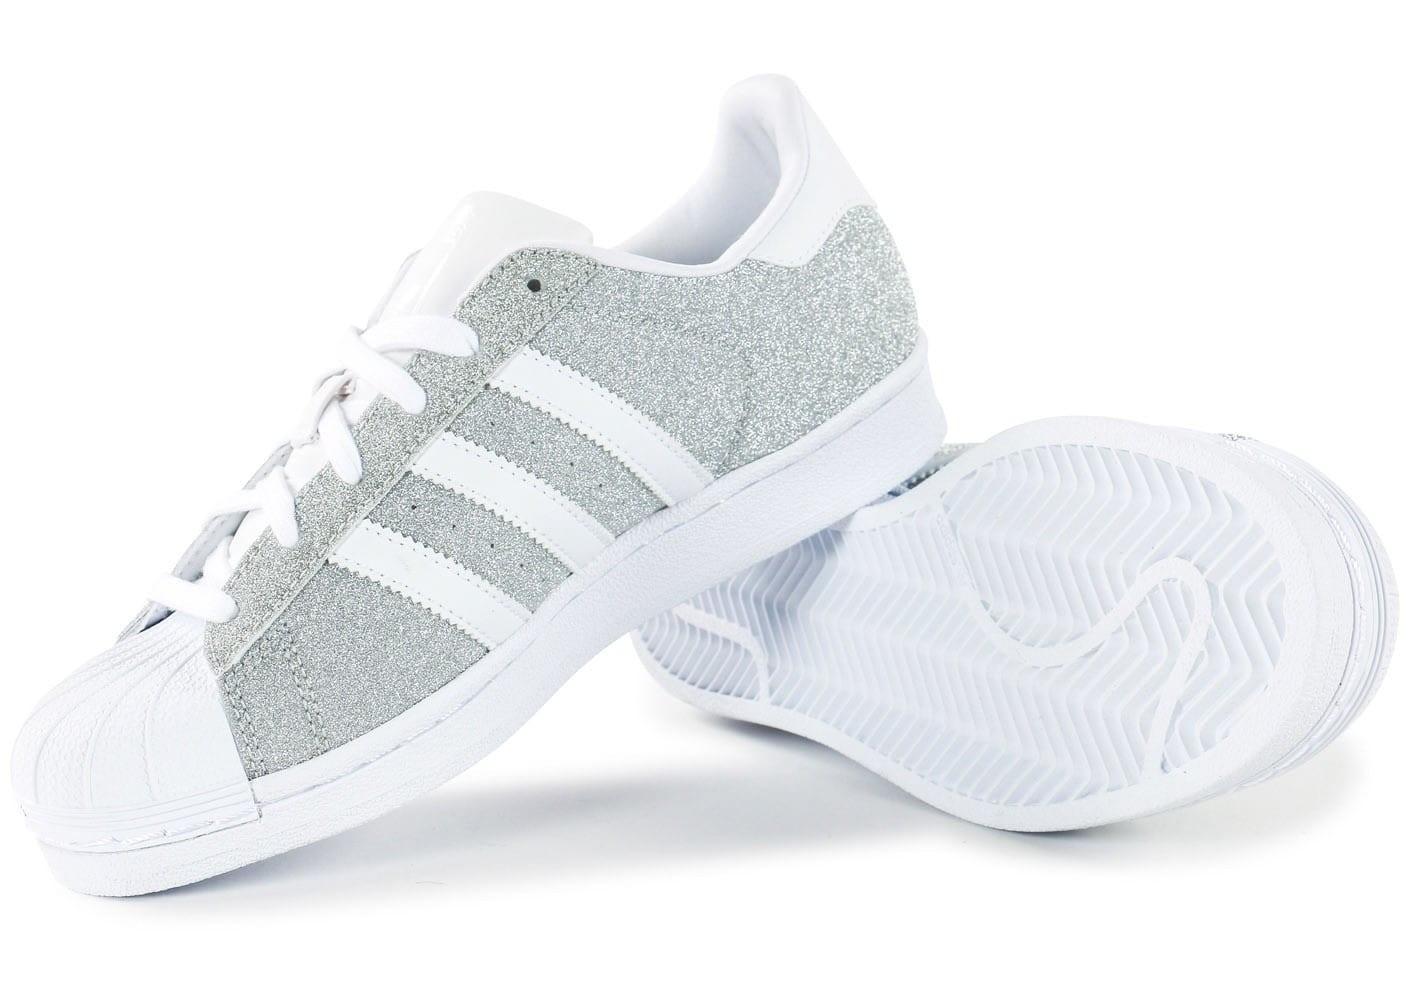 Femme Superstar Superstar Paillette Femme Paillette Adidas Adidas Adidas  qw7xnxtE4g 1c3f340f7c43